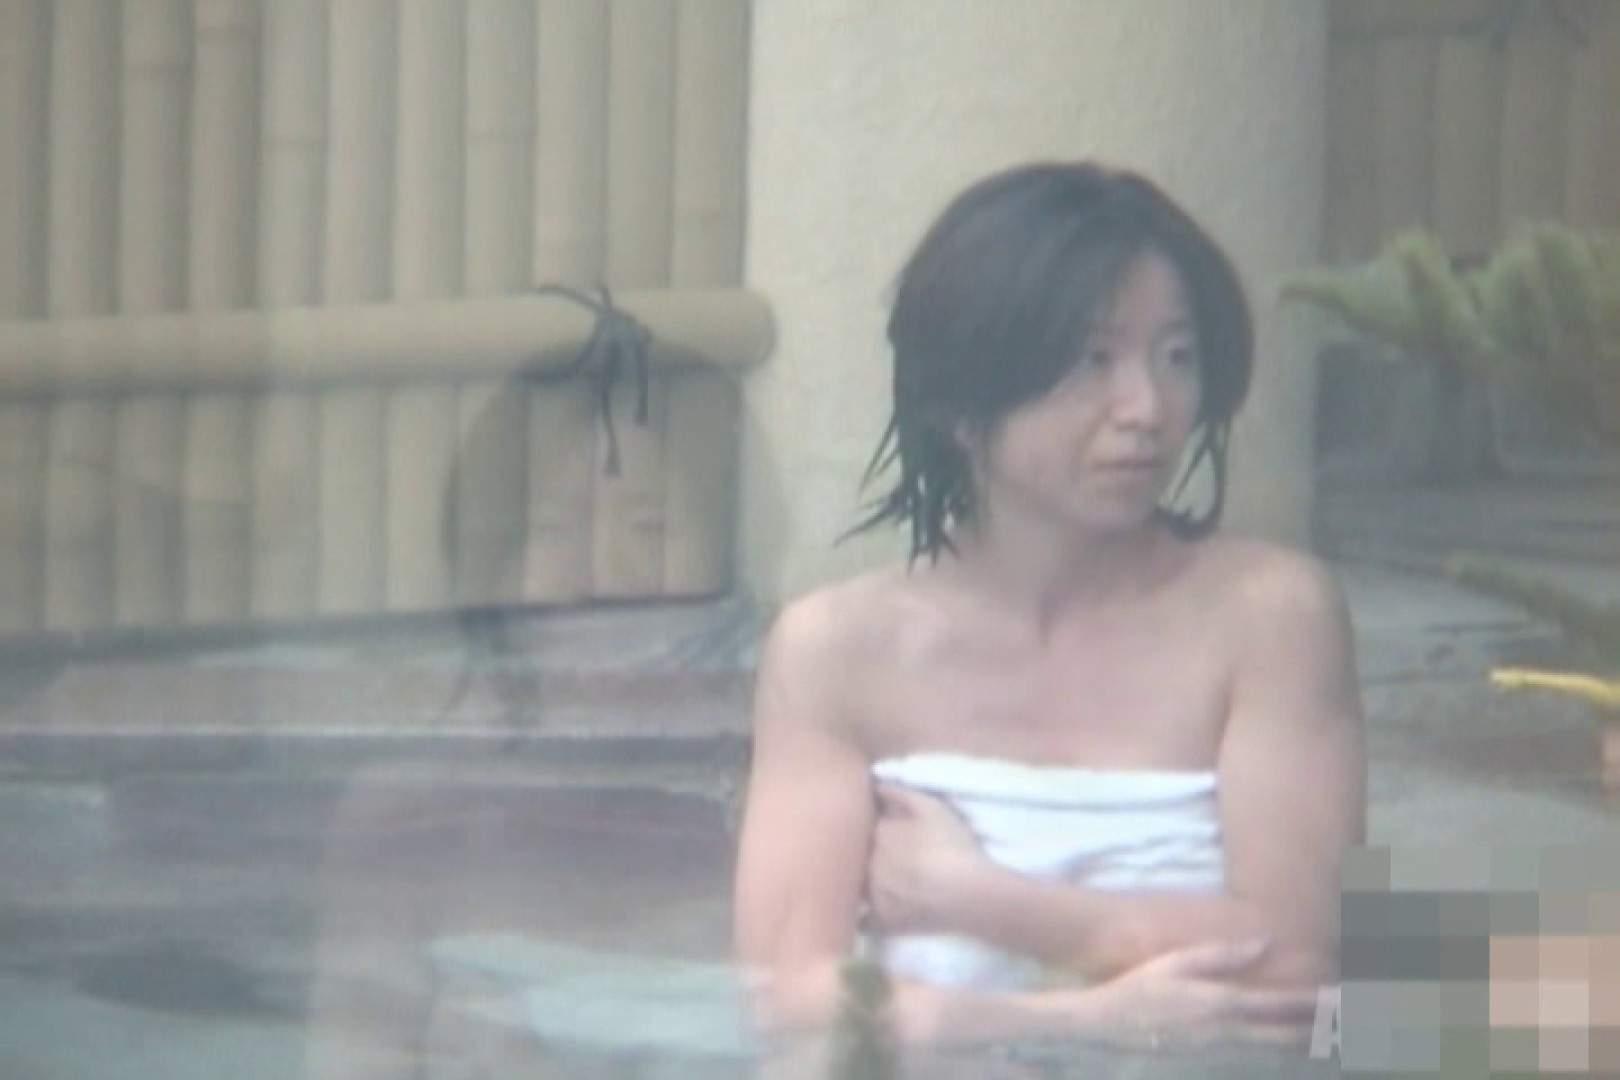 Aquaな露天風呂Vol.841 HなOL   盗撮  92pic 92